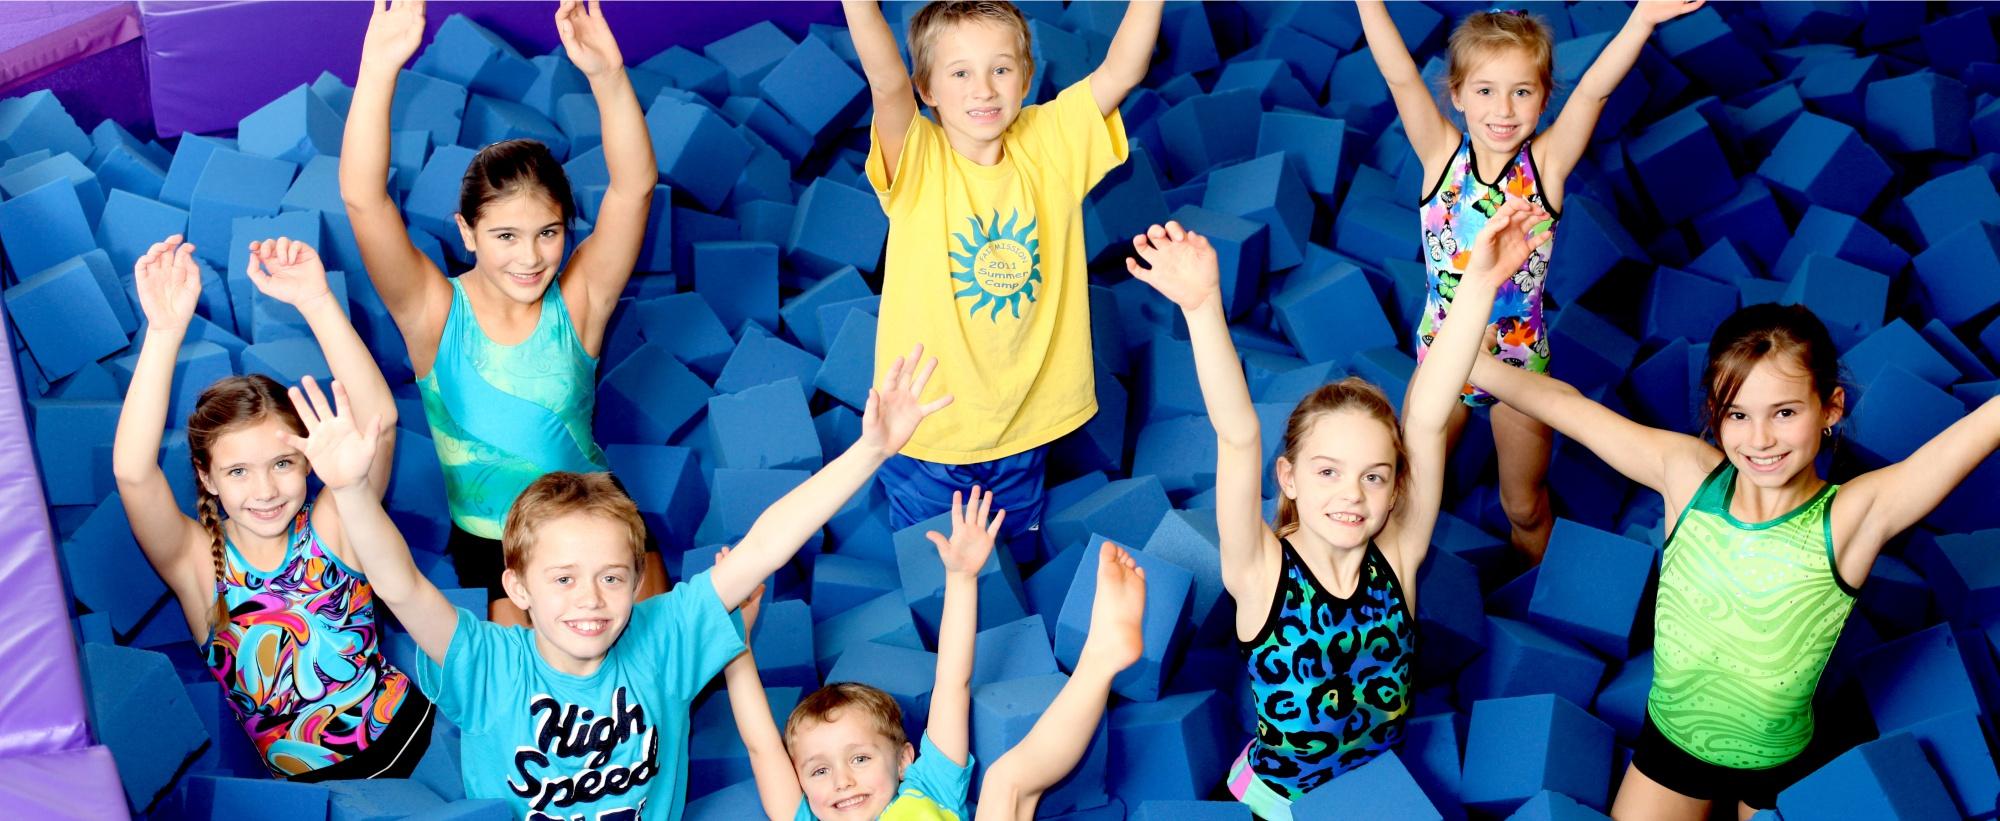 kelowna gymnastics drop-in 5 - 13 years